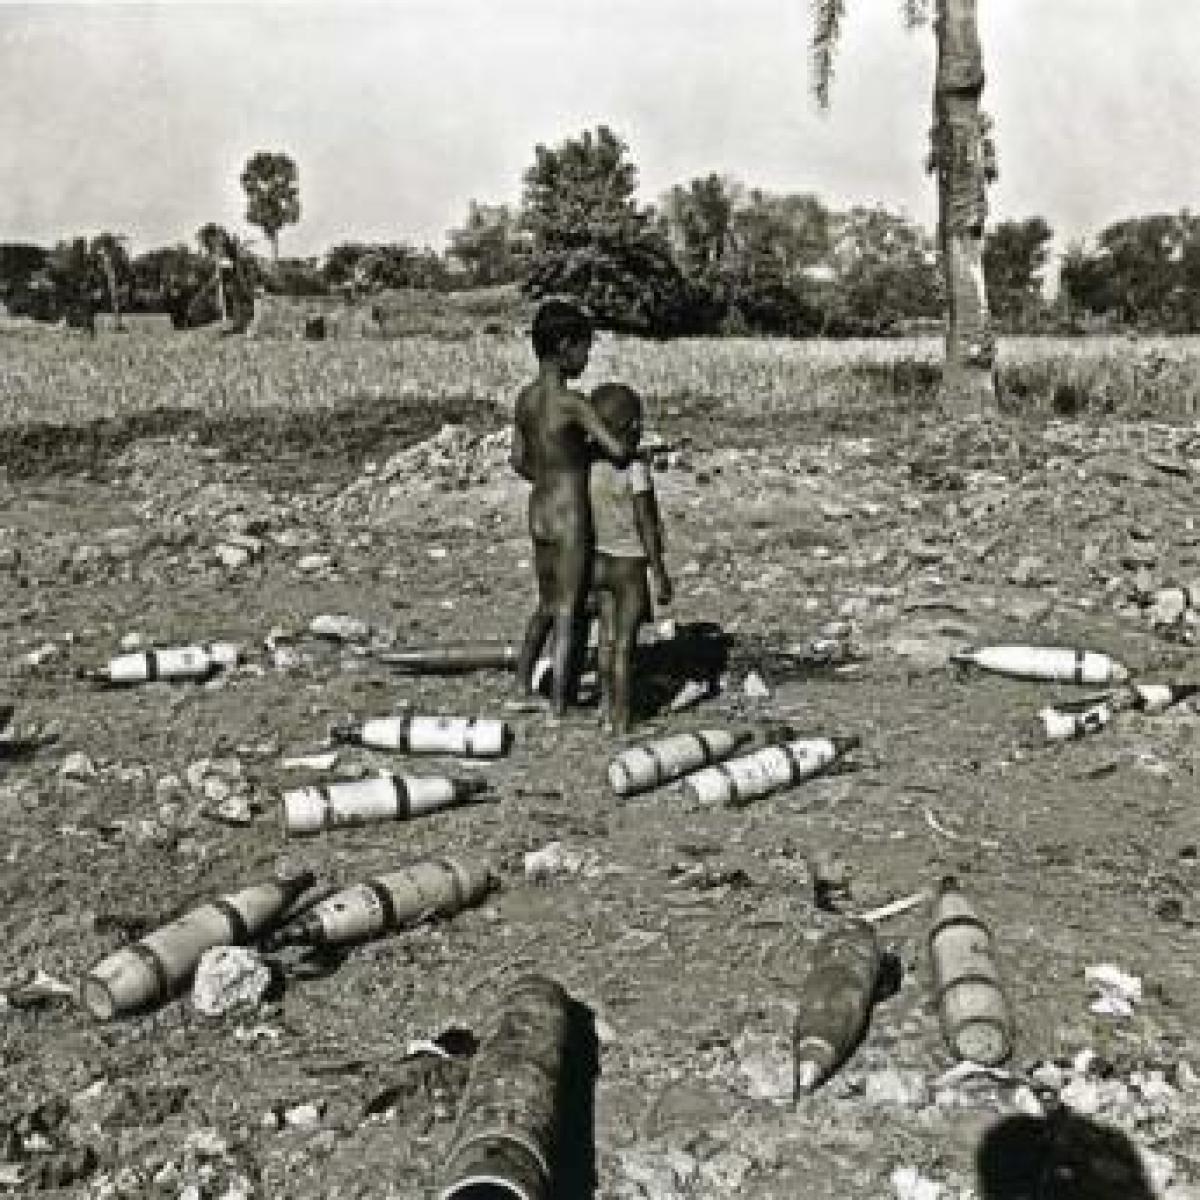 1971 Indo-Pak war era mortar shells found